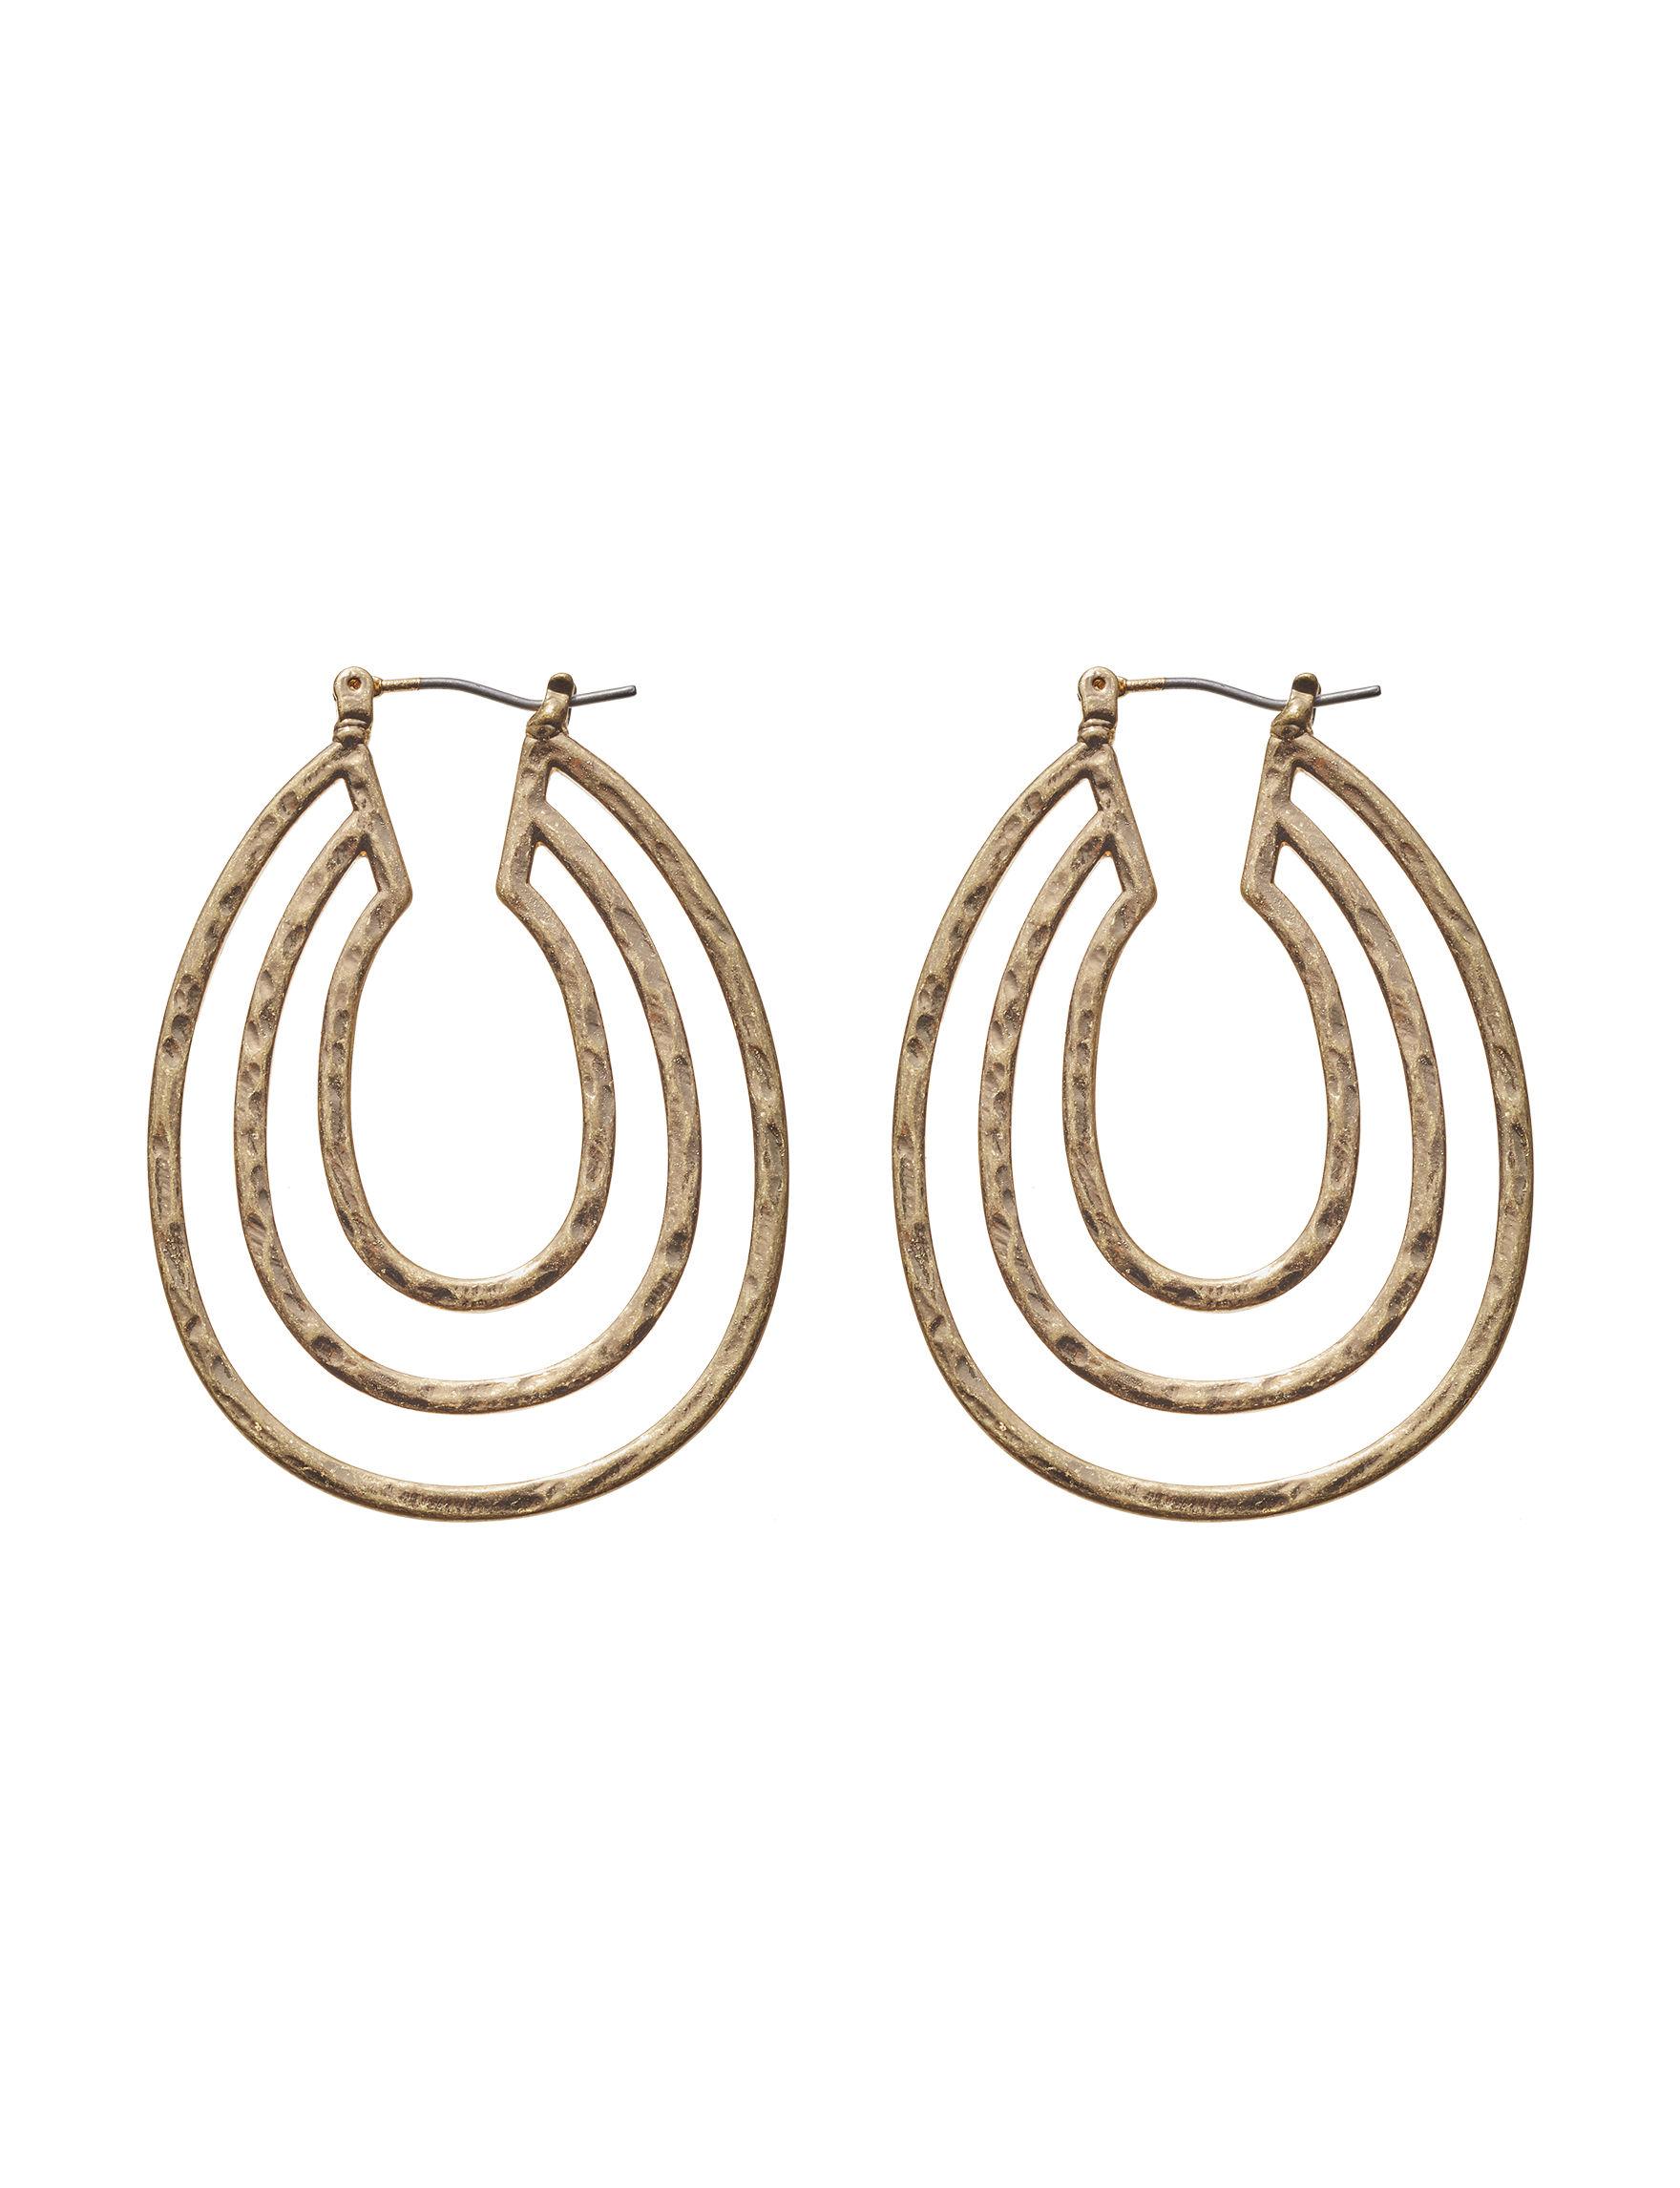 Blank Canvas Gold Drops Earrings Fashion Jewelry